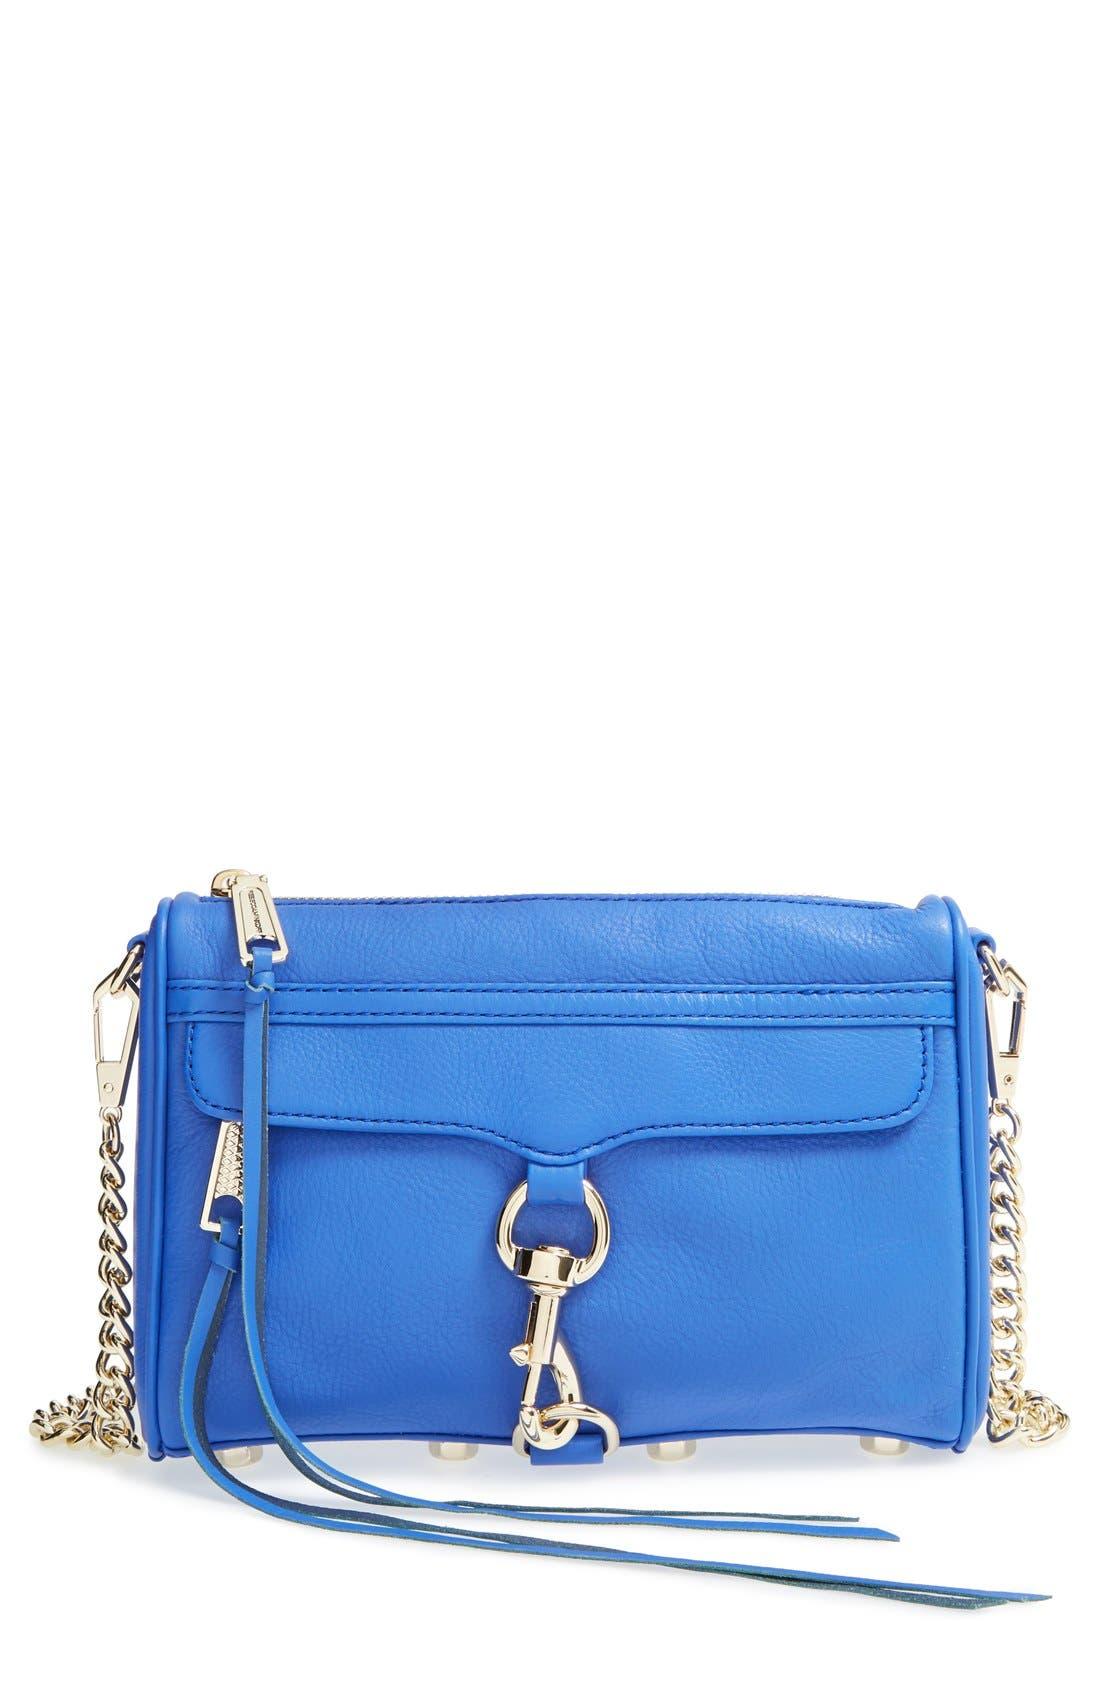 Alternate Image 1 Selected - Rebecca Minkoff 'Mini MAC' Convertible Crossbody Bag